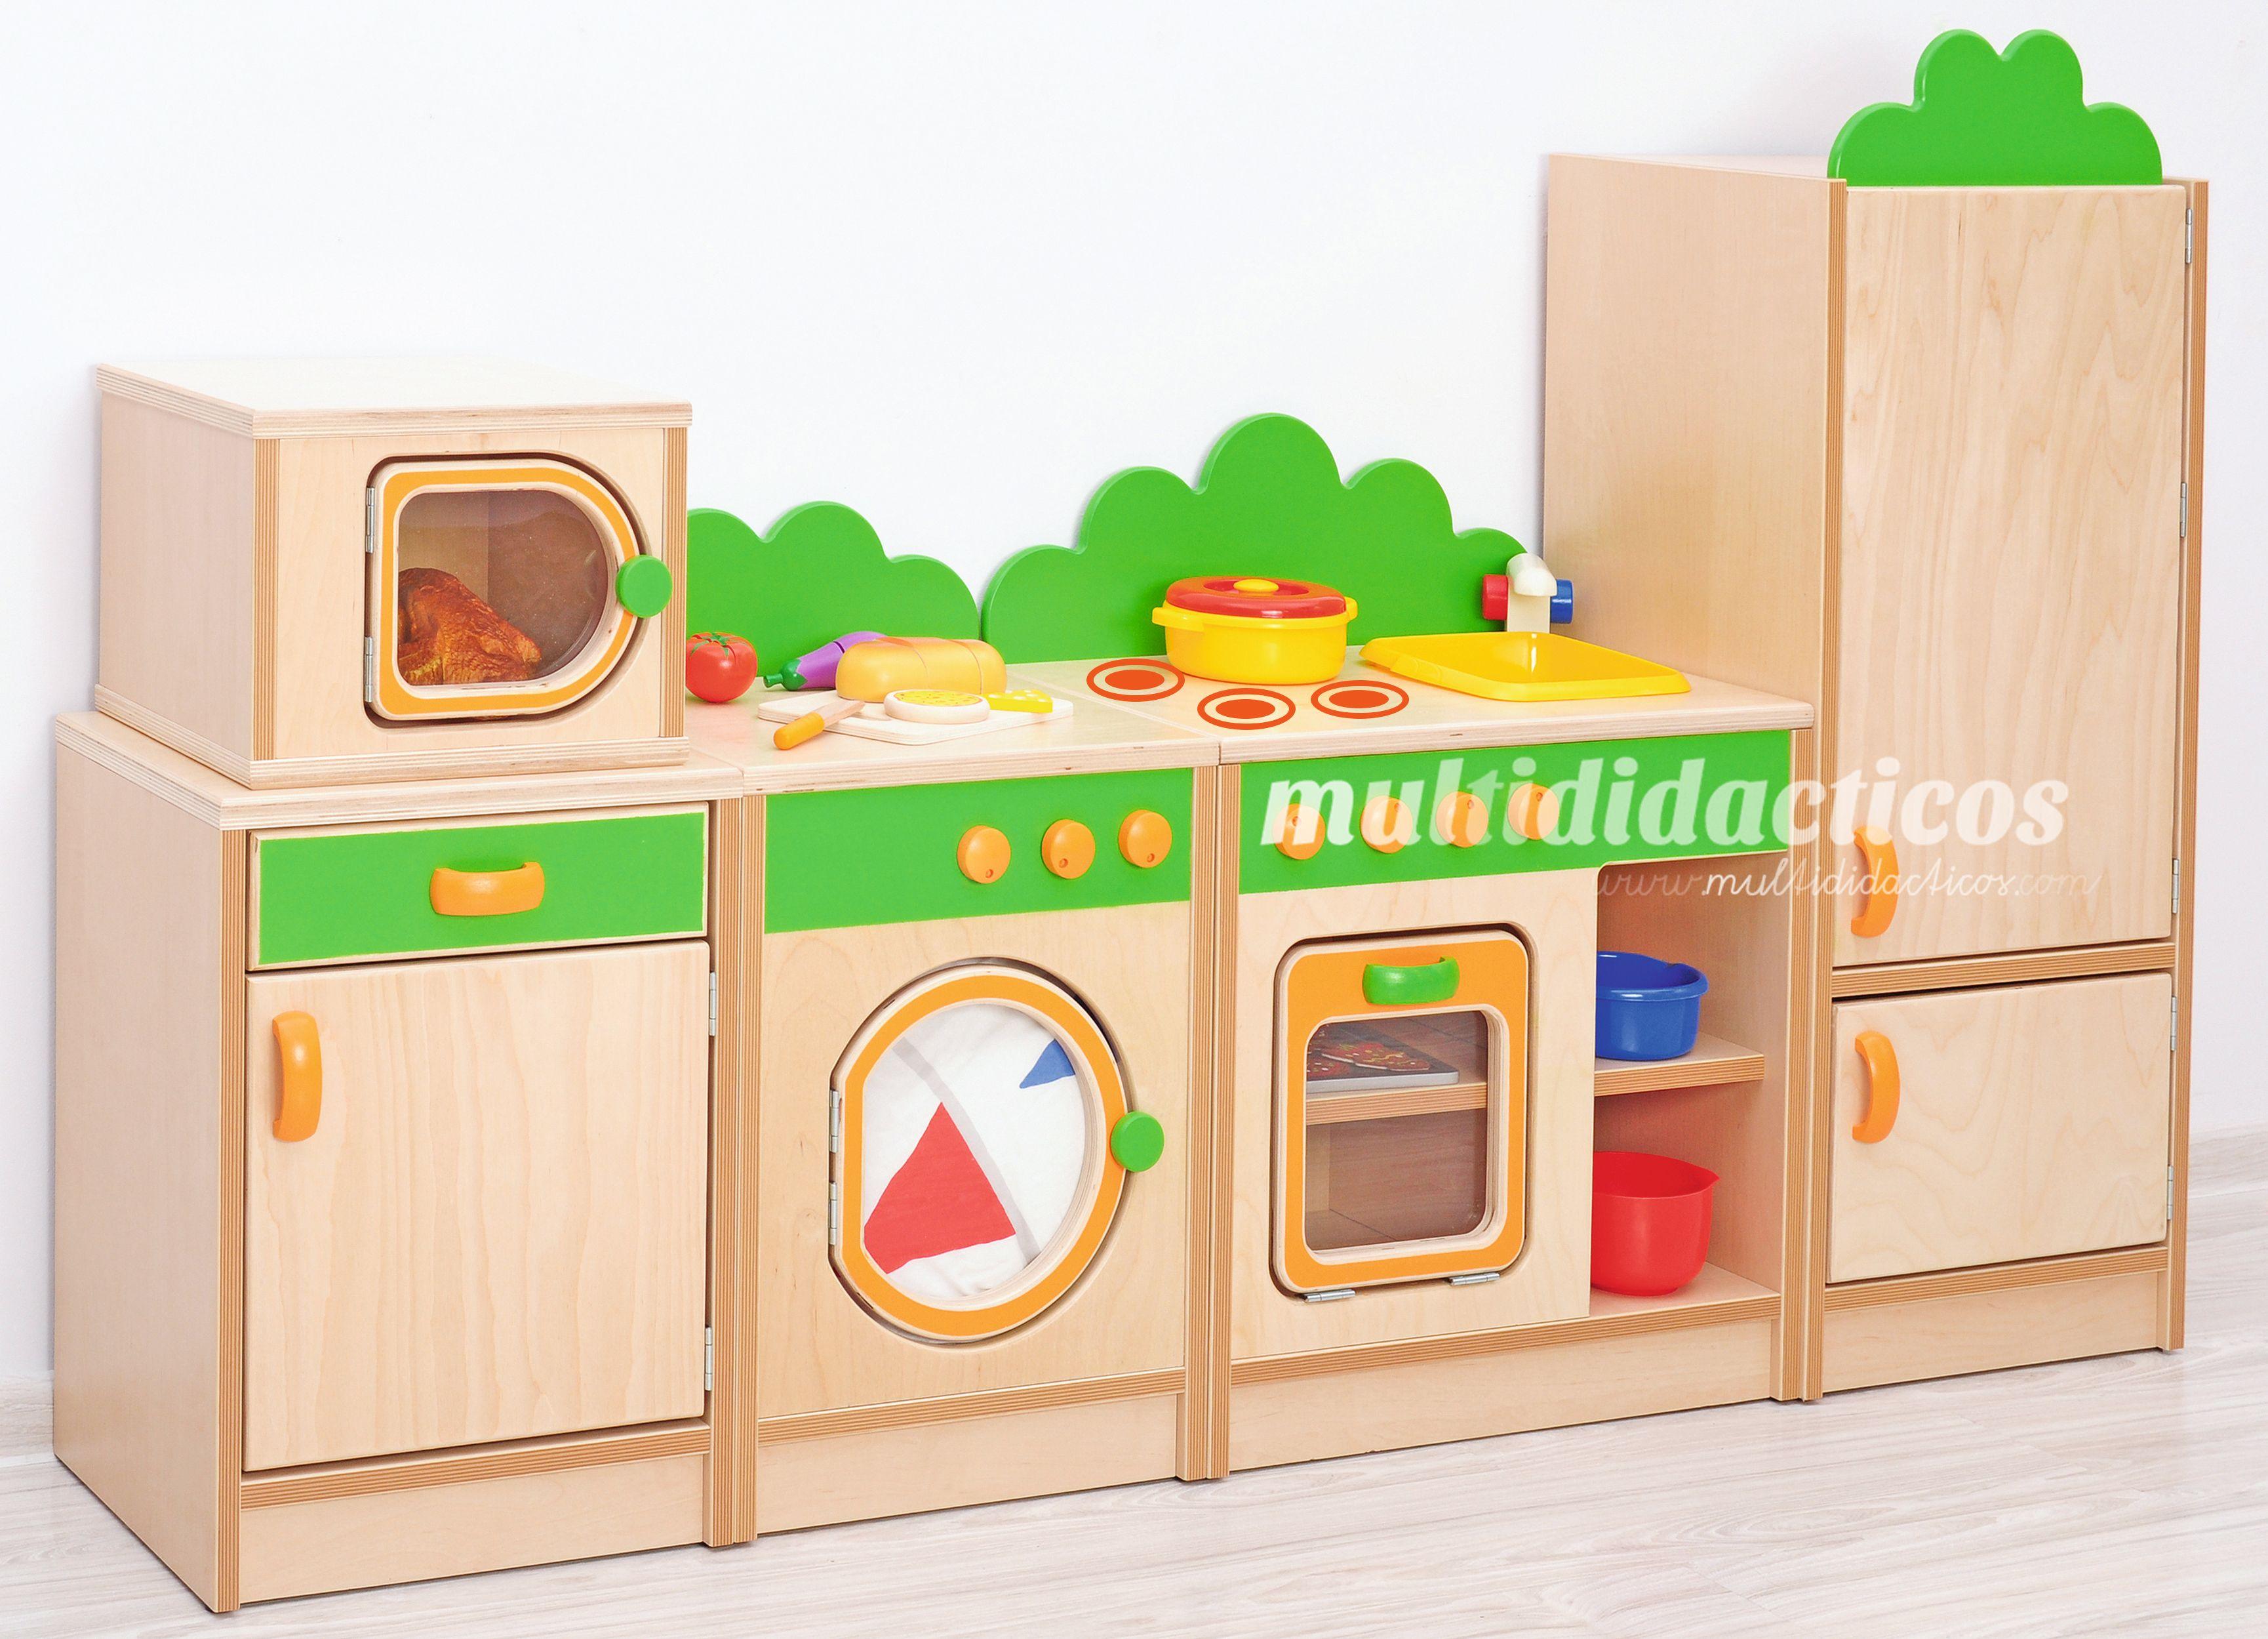 Pin de Grupo Multididacticos en Mobiliario infantil | Pinterest ...